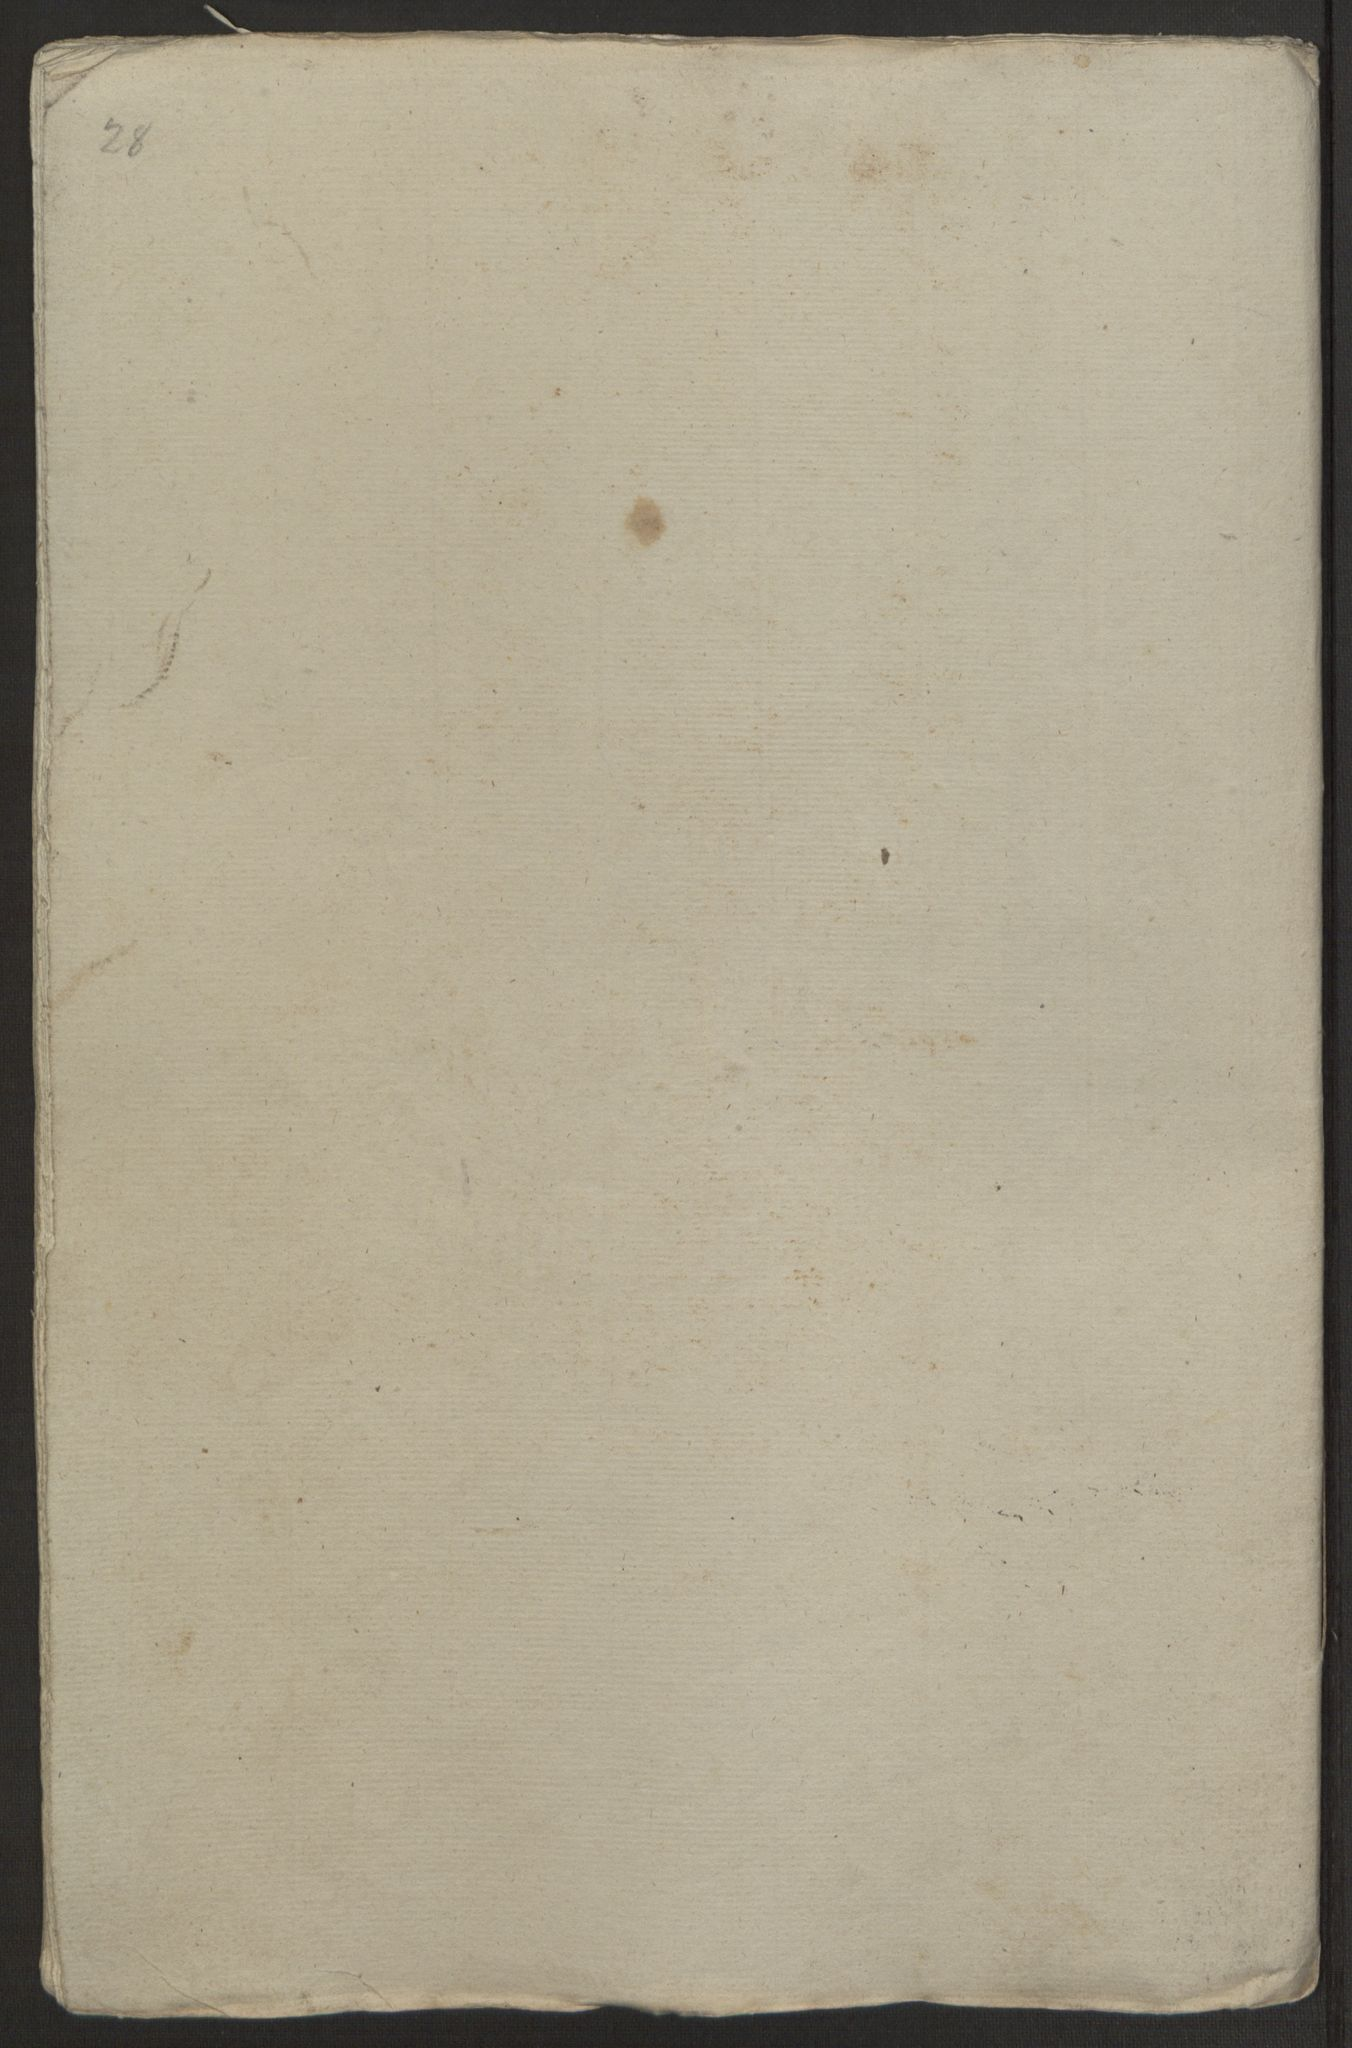 RA, Rentekammeret inntil 1814, Realistisk ordnet avdeling, Ol/L0022a: [Gg 10]: Ekstraskatten, 23.09.1762. Nordlands amt, 1763-1769, s. 208